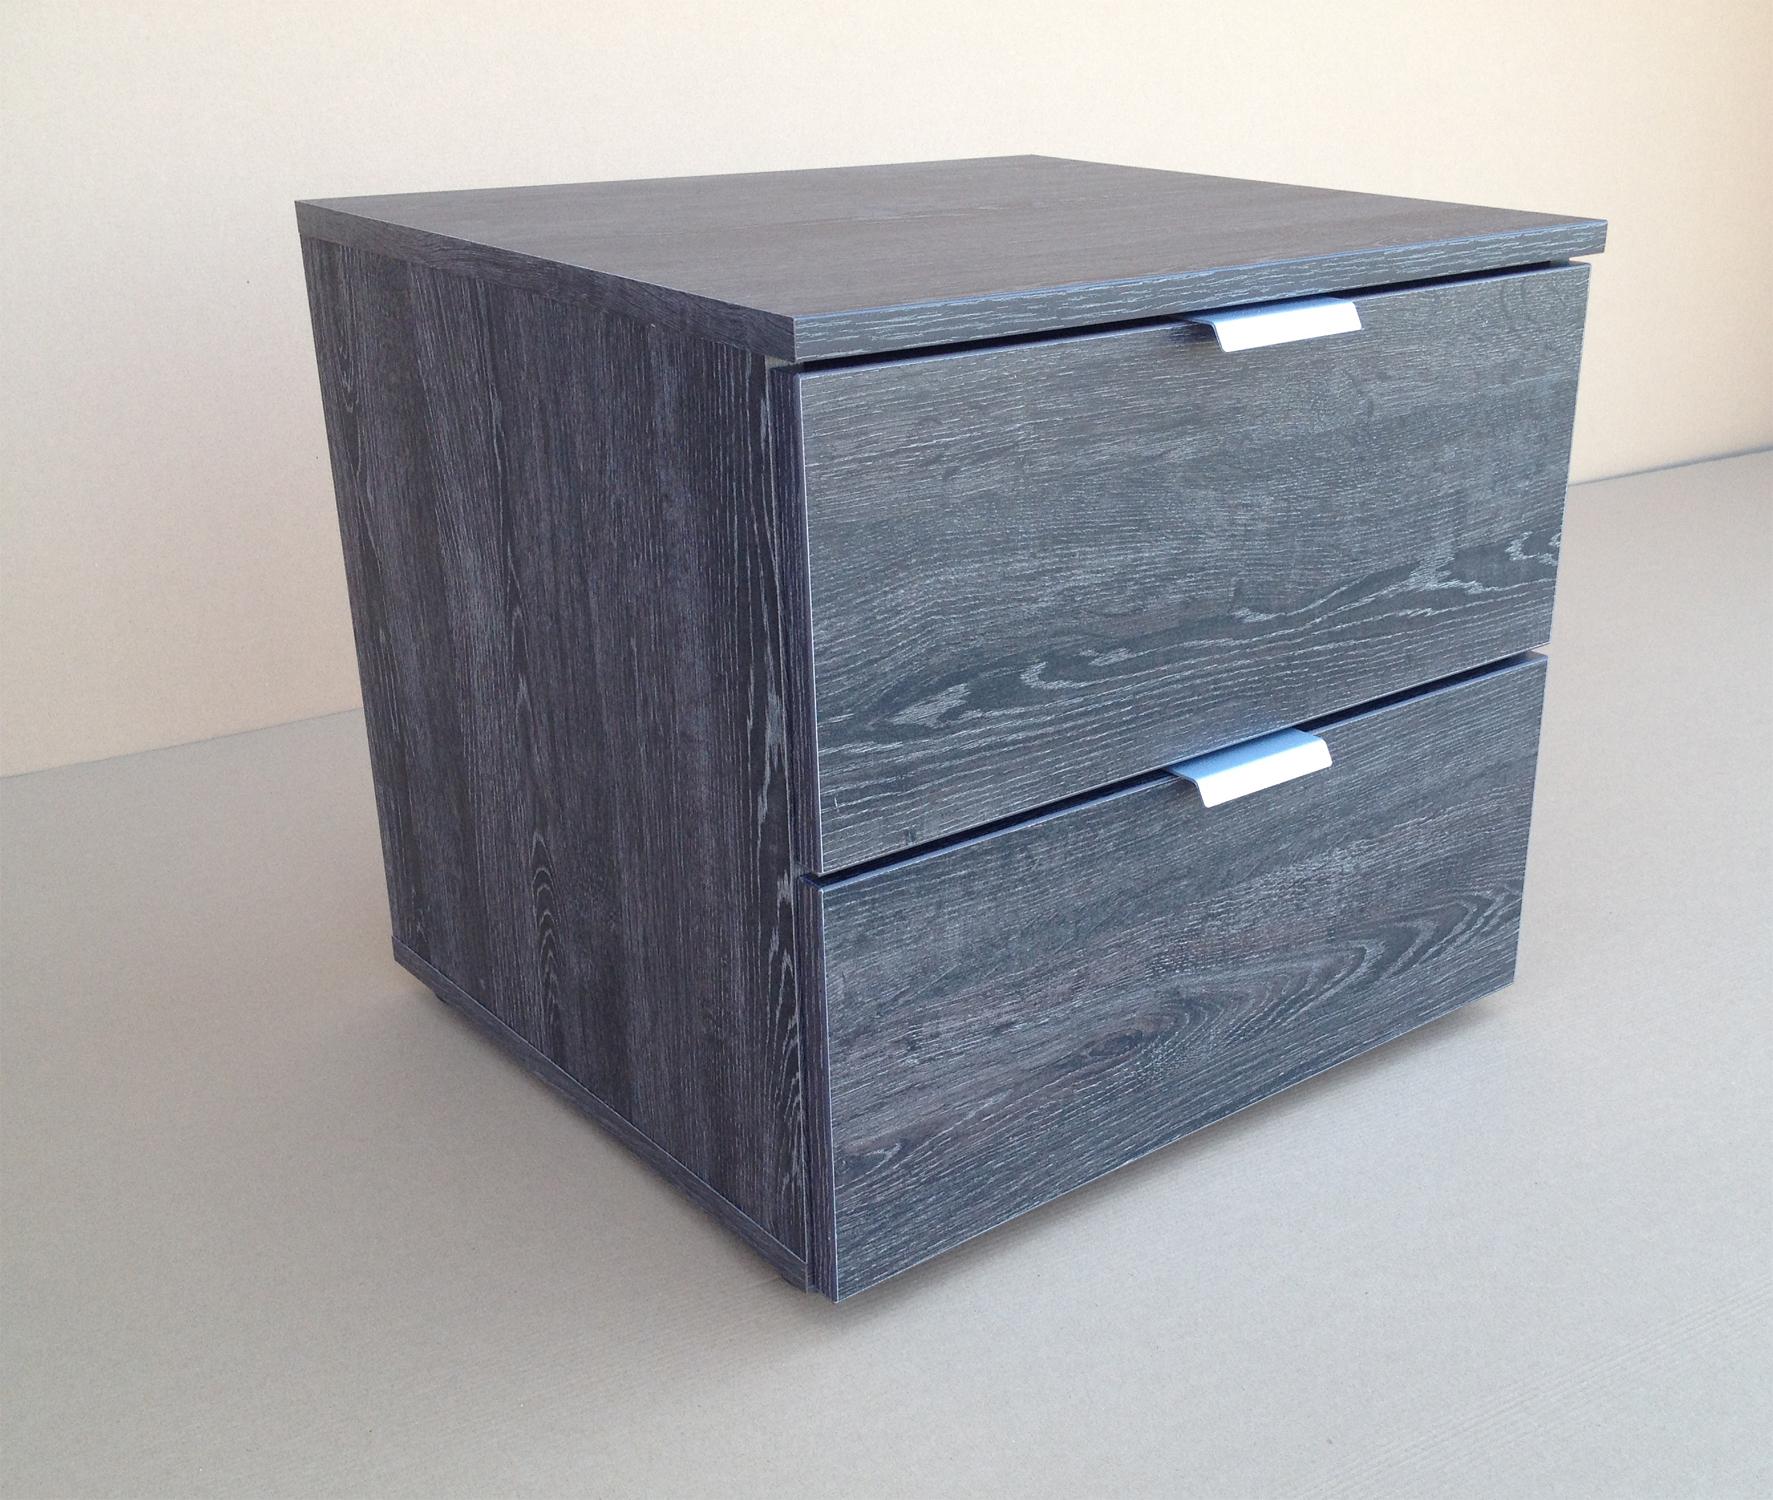 nachtkonsolen f r boxspringbetten ebenbild das sieht luxus. Black Bedroom Furniture Sets. Home Design Ideas